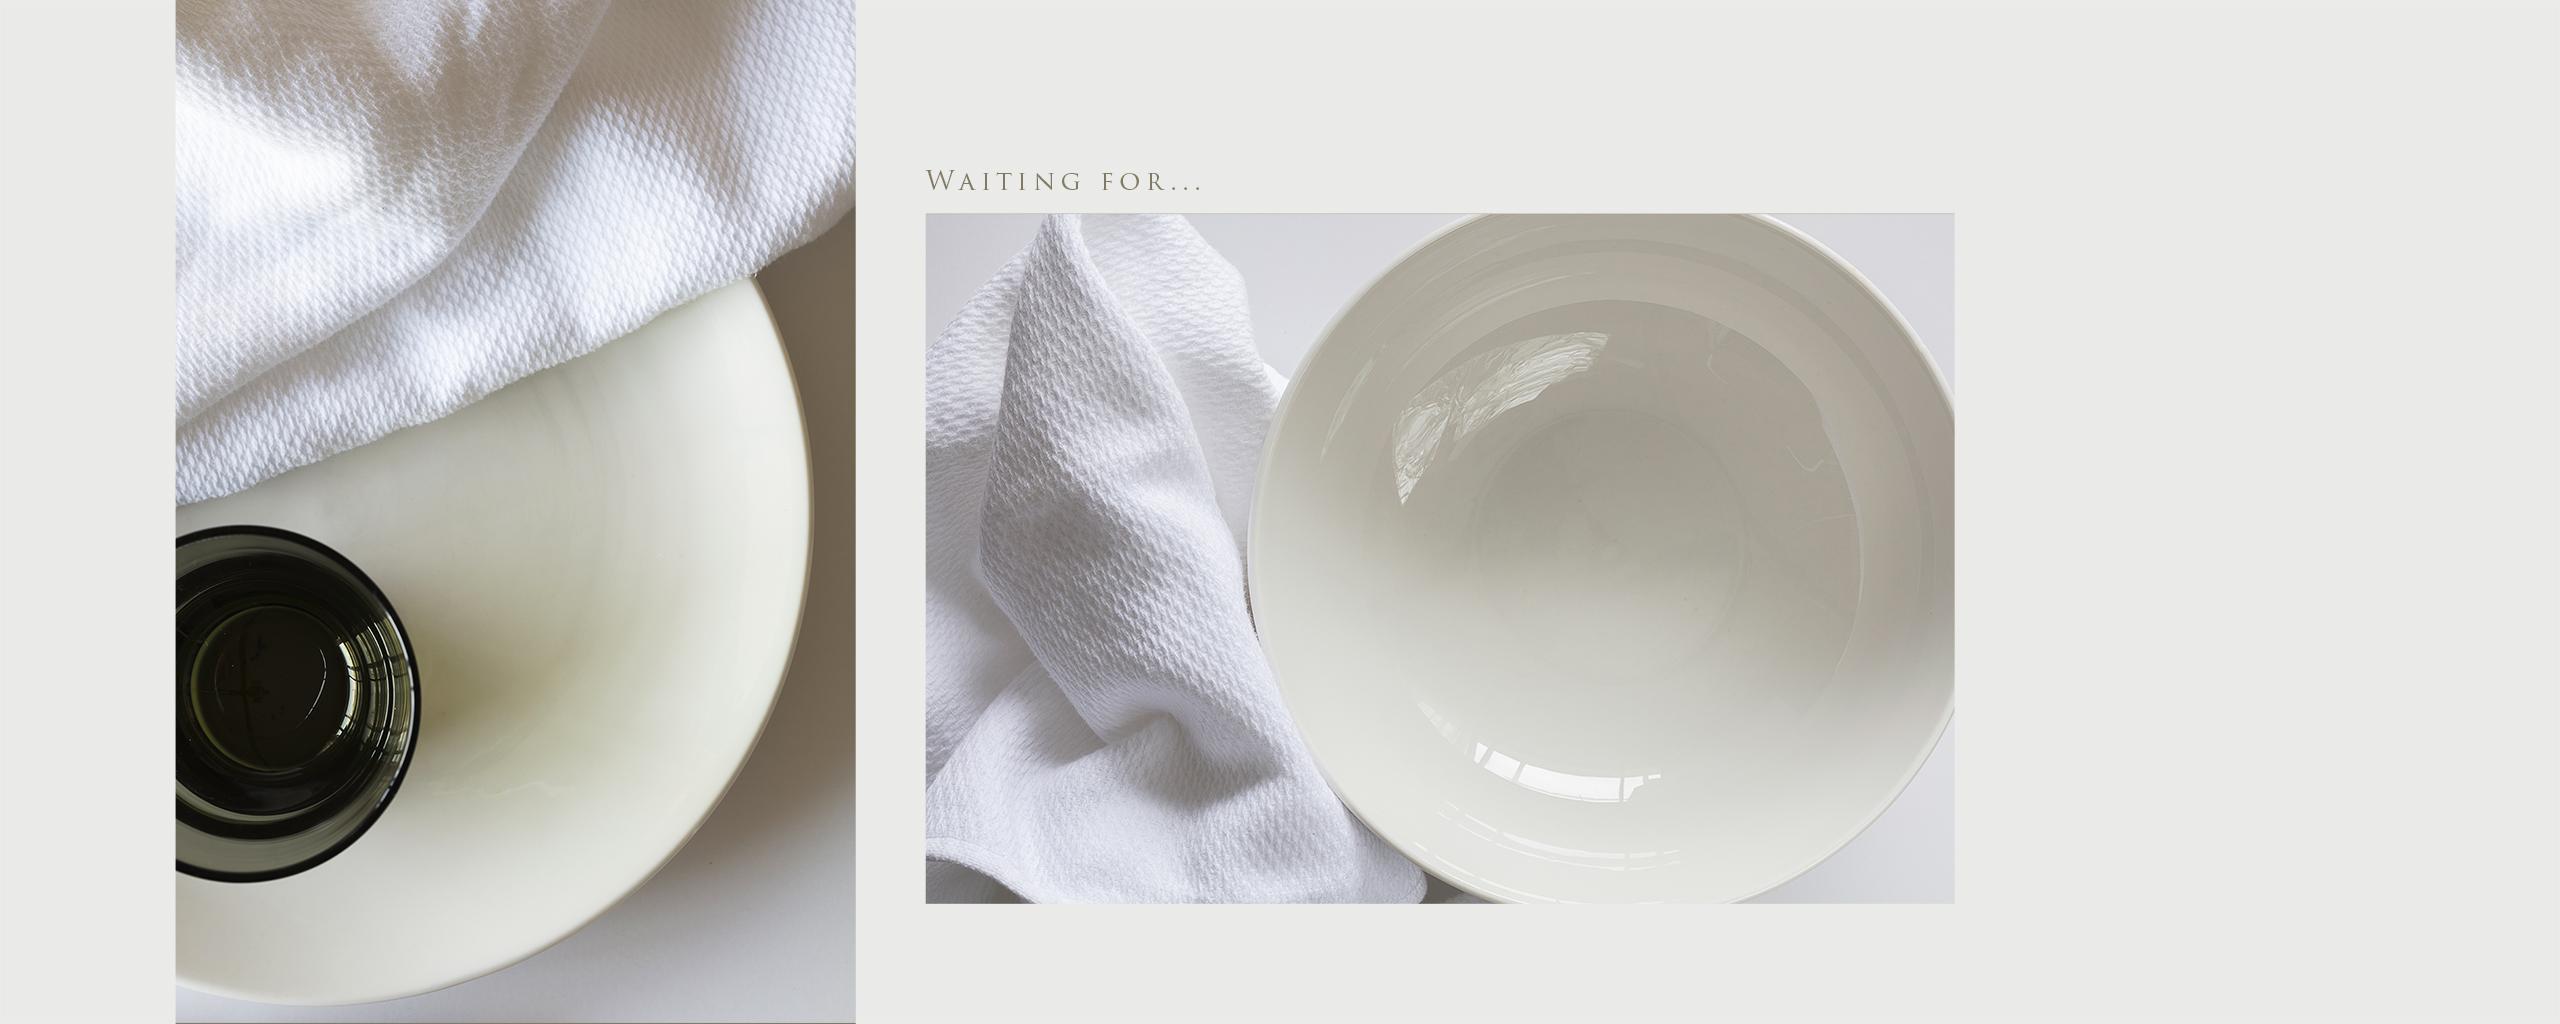 005-Jamaican-Waiting-.jpg